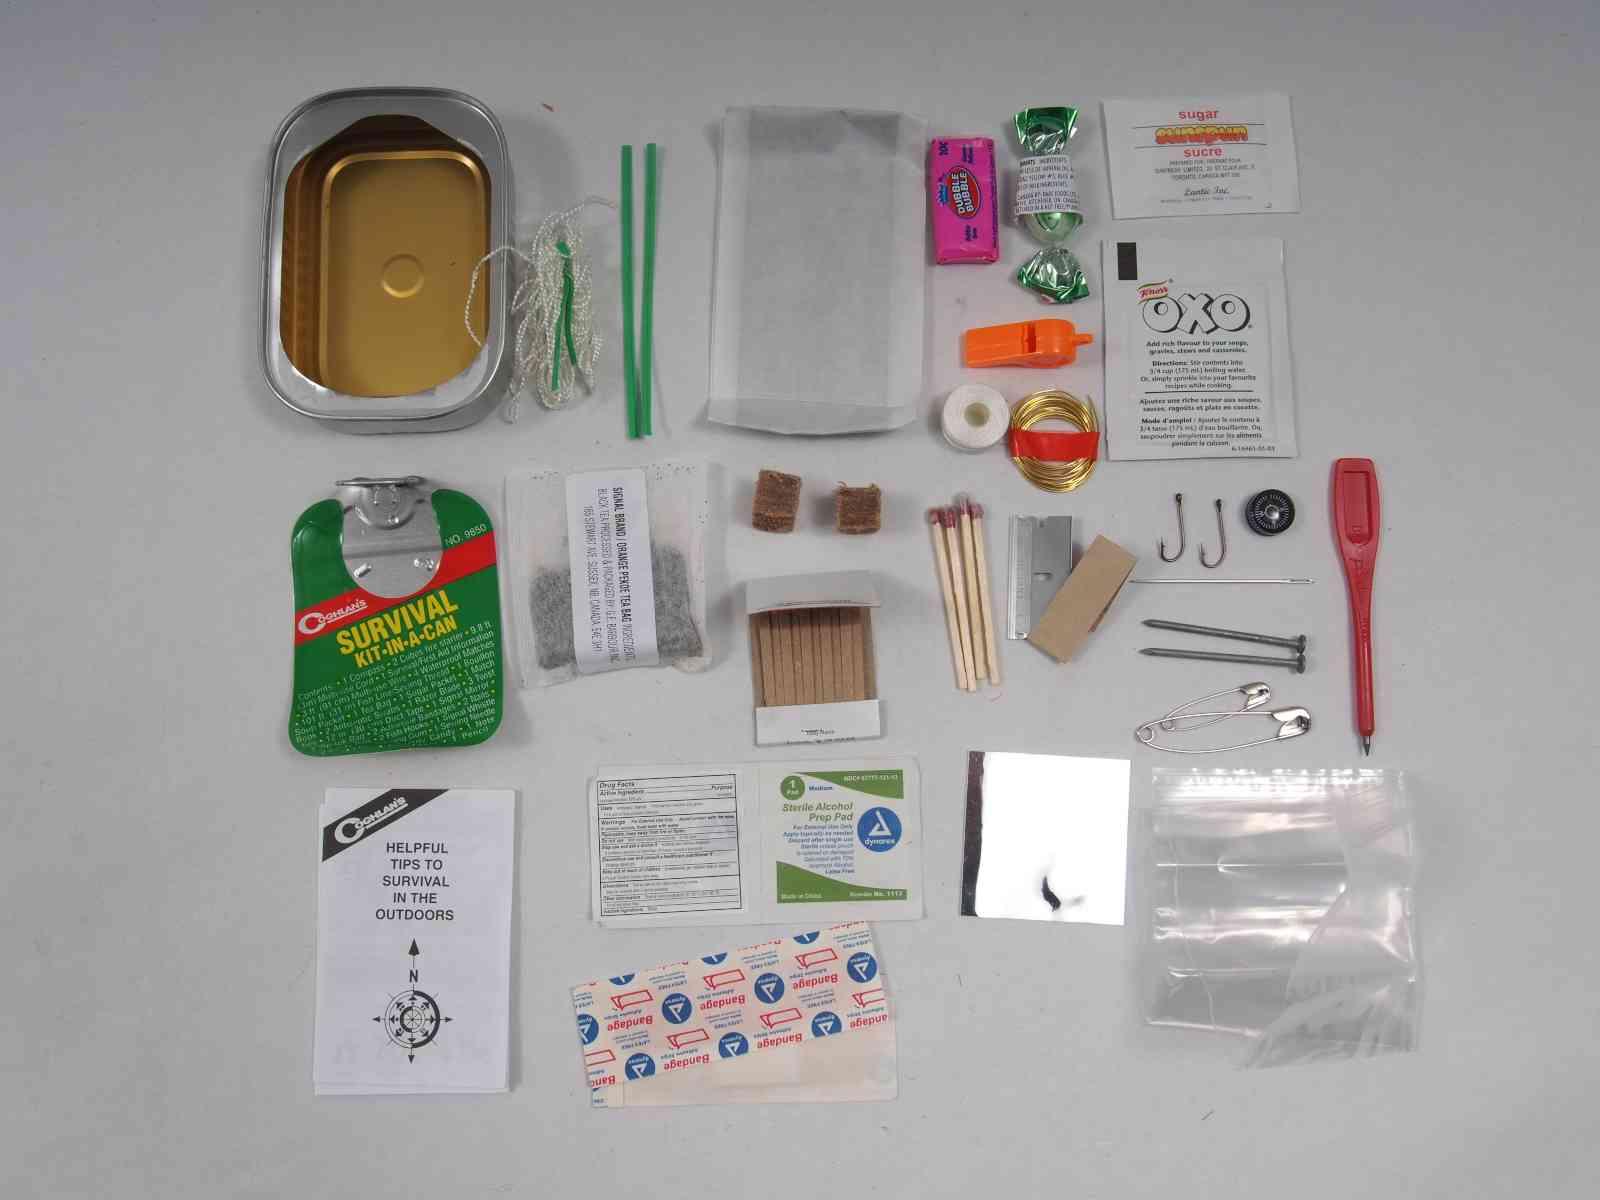 Coghlan's Survival-Kit - Kit-in-a-Can - Inhalt